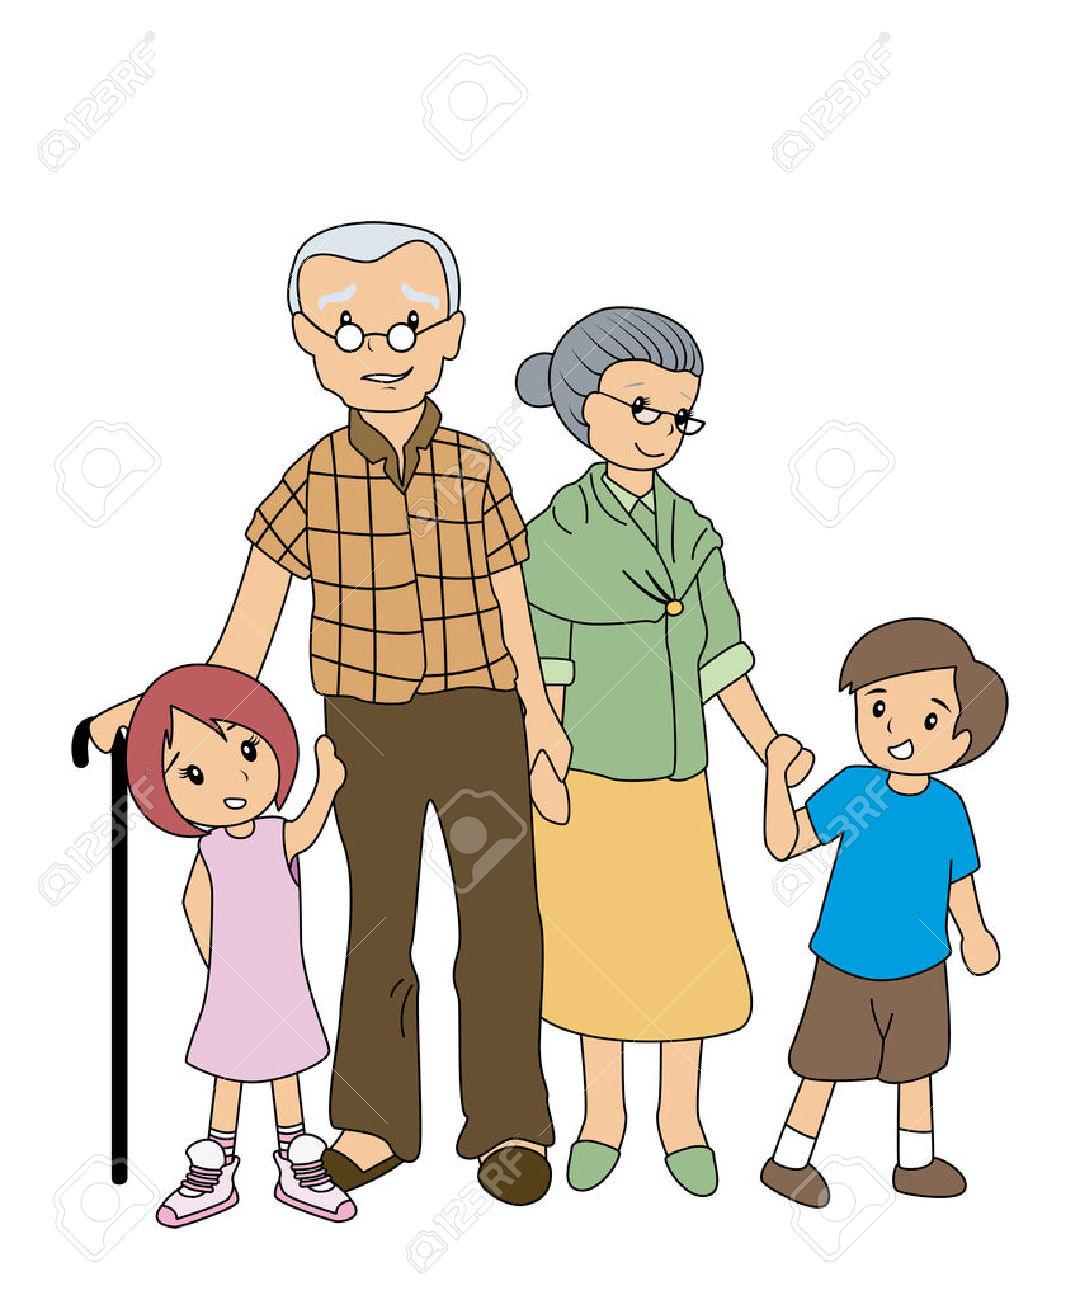 Grandparents with grandchildren clipart royalty free download Grandparents with grandchildren clipart 6 » Clipart Station royalty free download